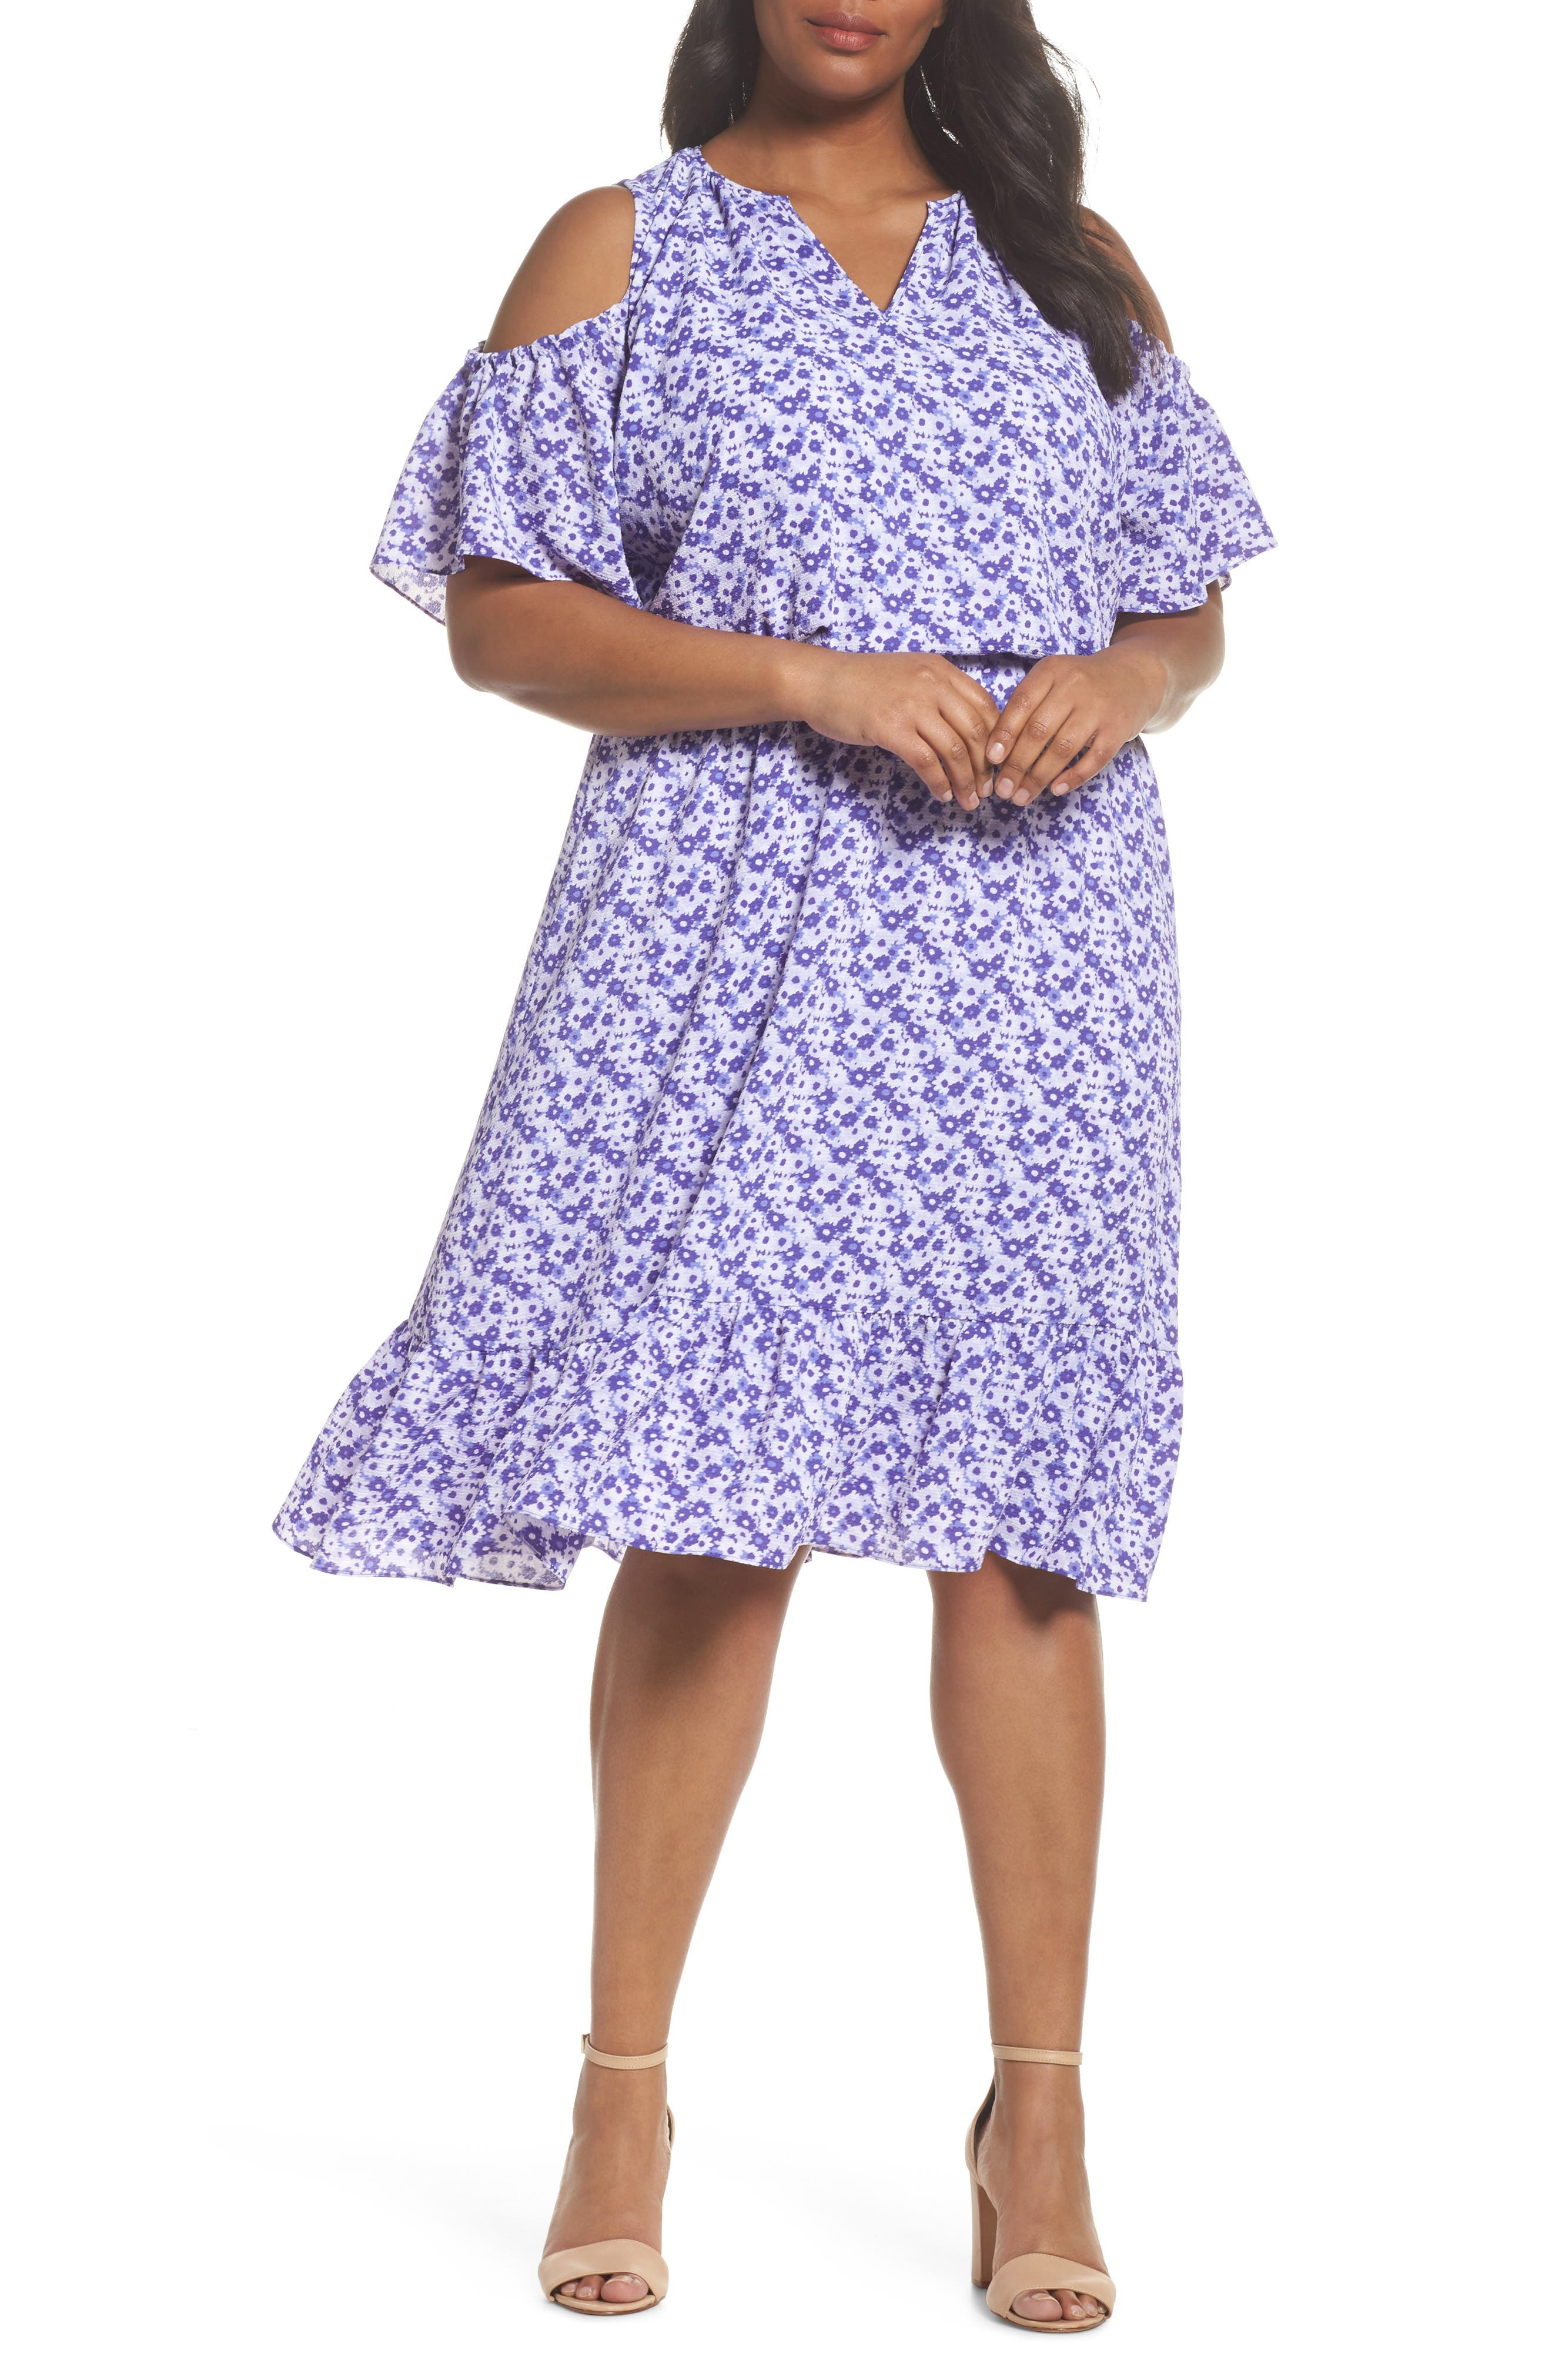 Floral Cold Shoulder Midi Dress,                             Main thumbnail 1, color,                             Amethyst/ Light Quartz Multi